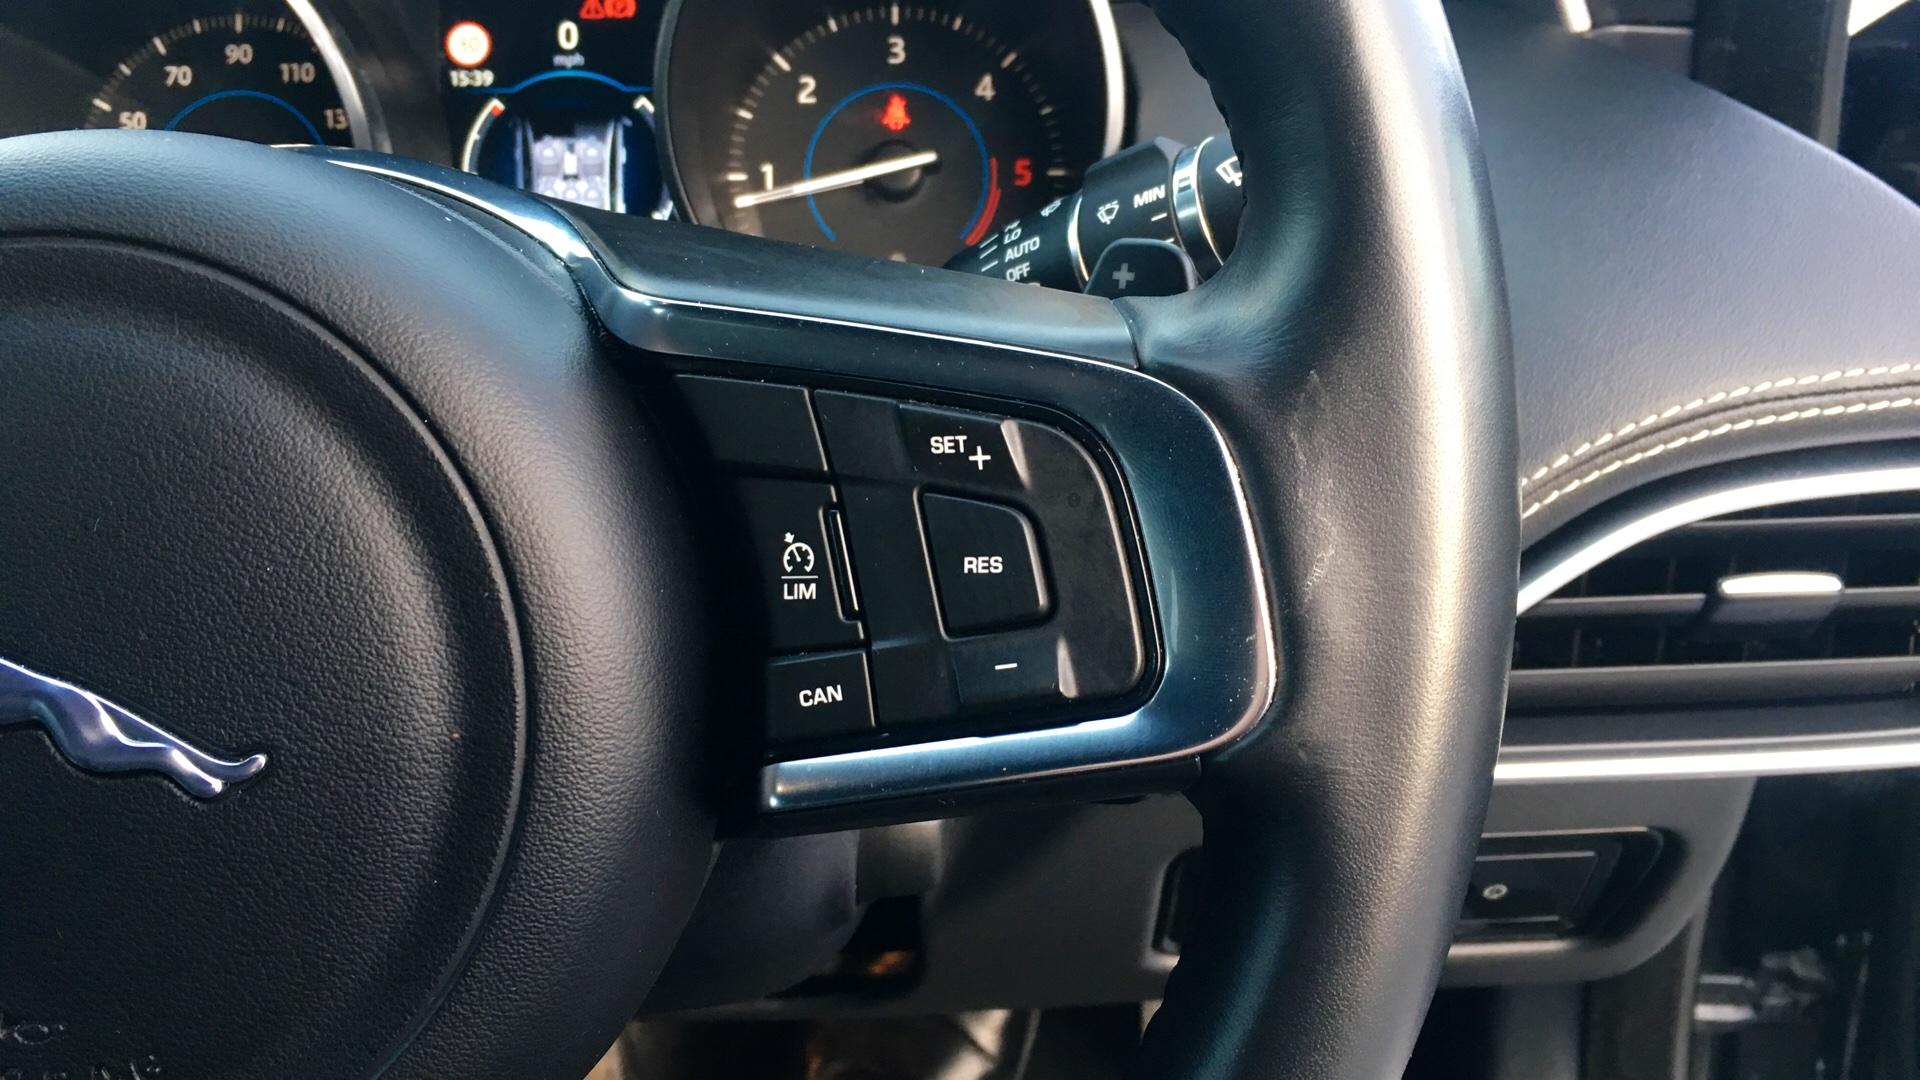 Used Jaguar XE 2 0D [180] R Sport 4Dr Auto Diesel Saloon for Sale in